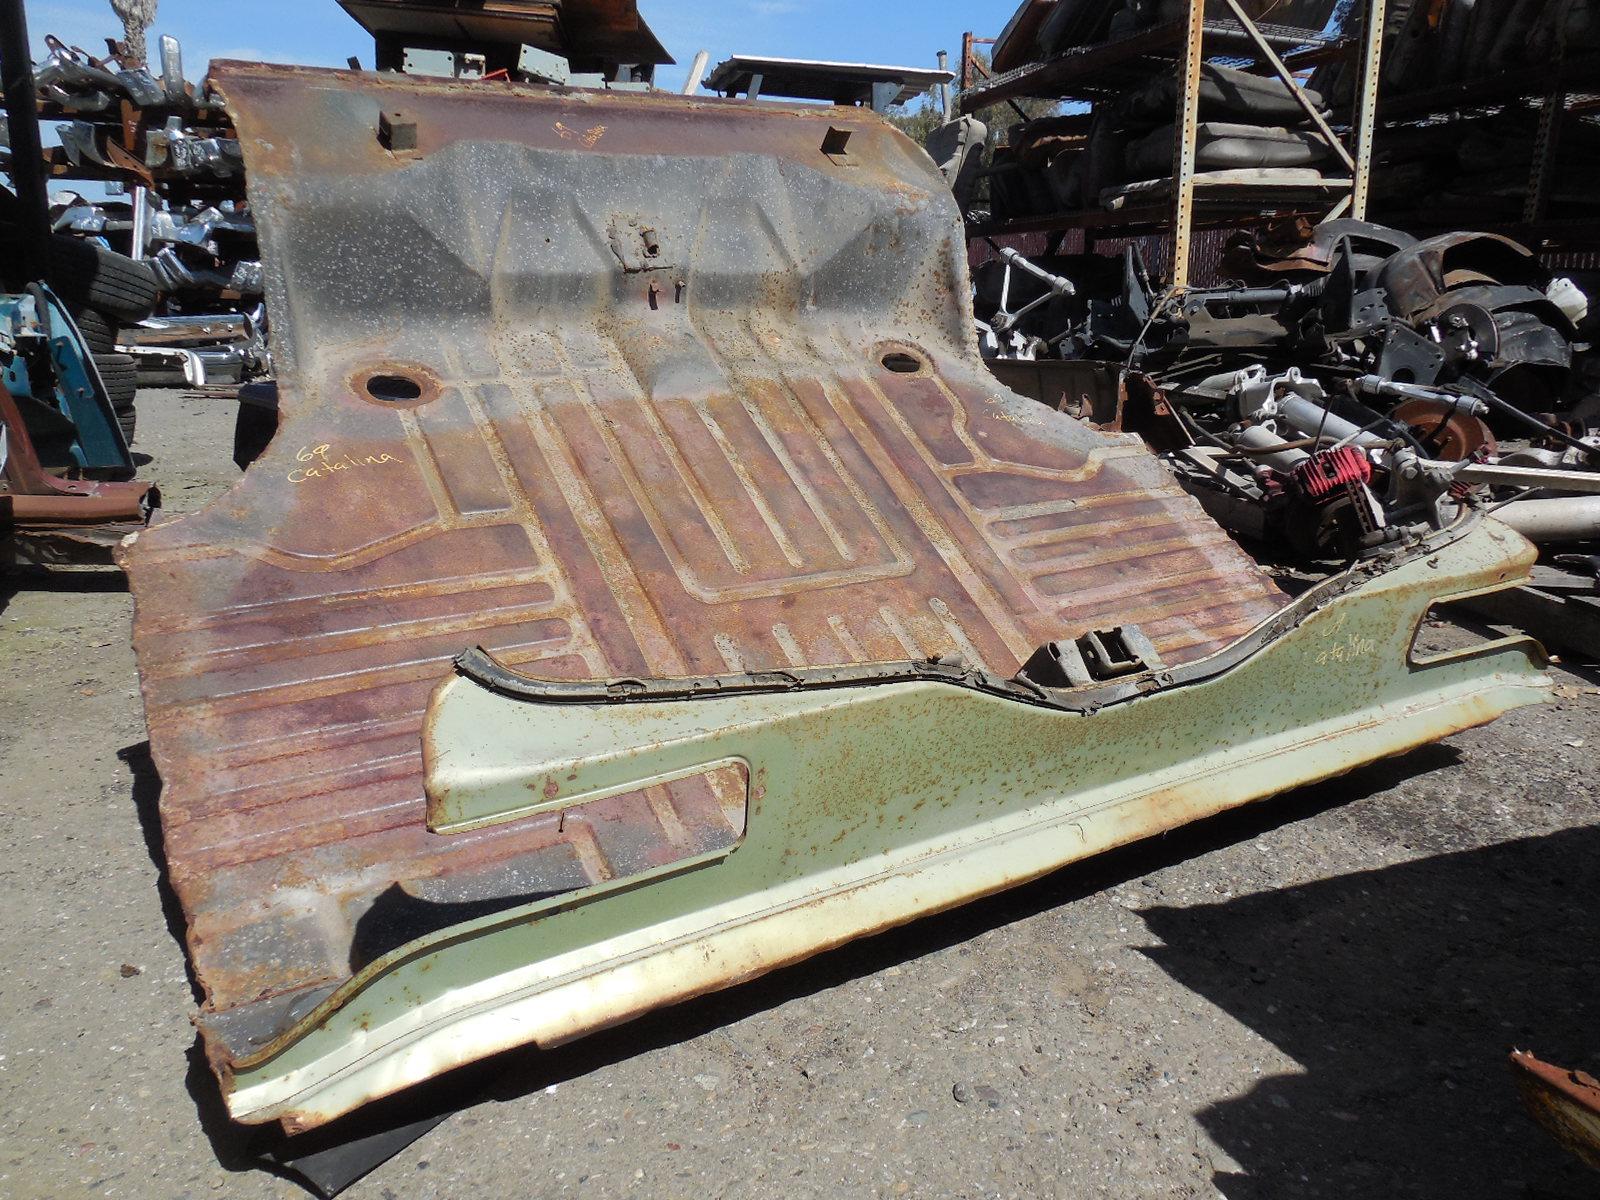 1969 Pontiac Catalina Trunk Floor Gm Sports